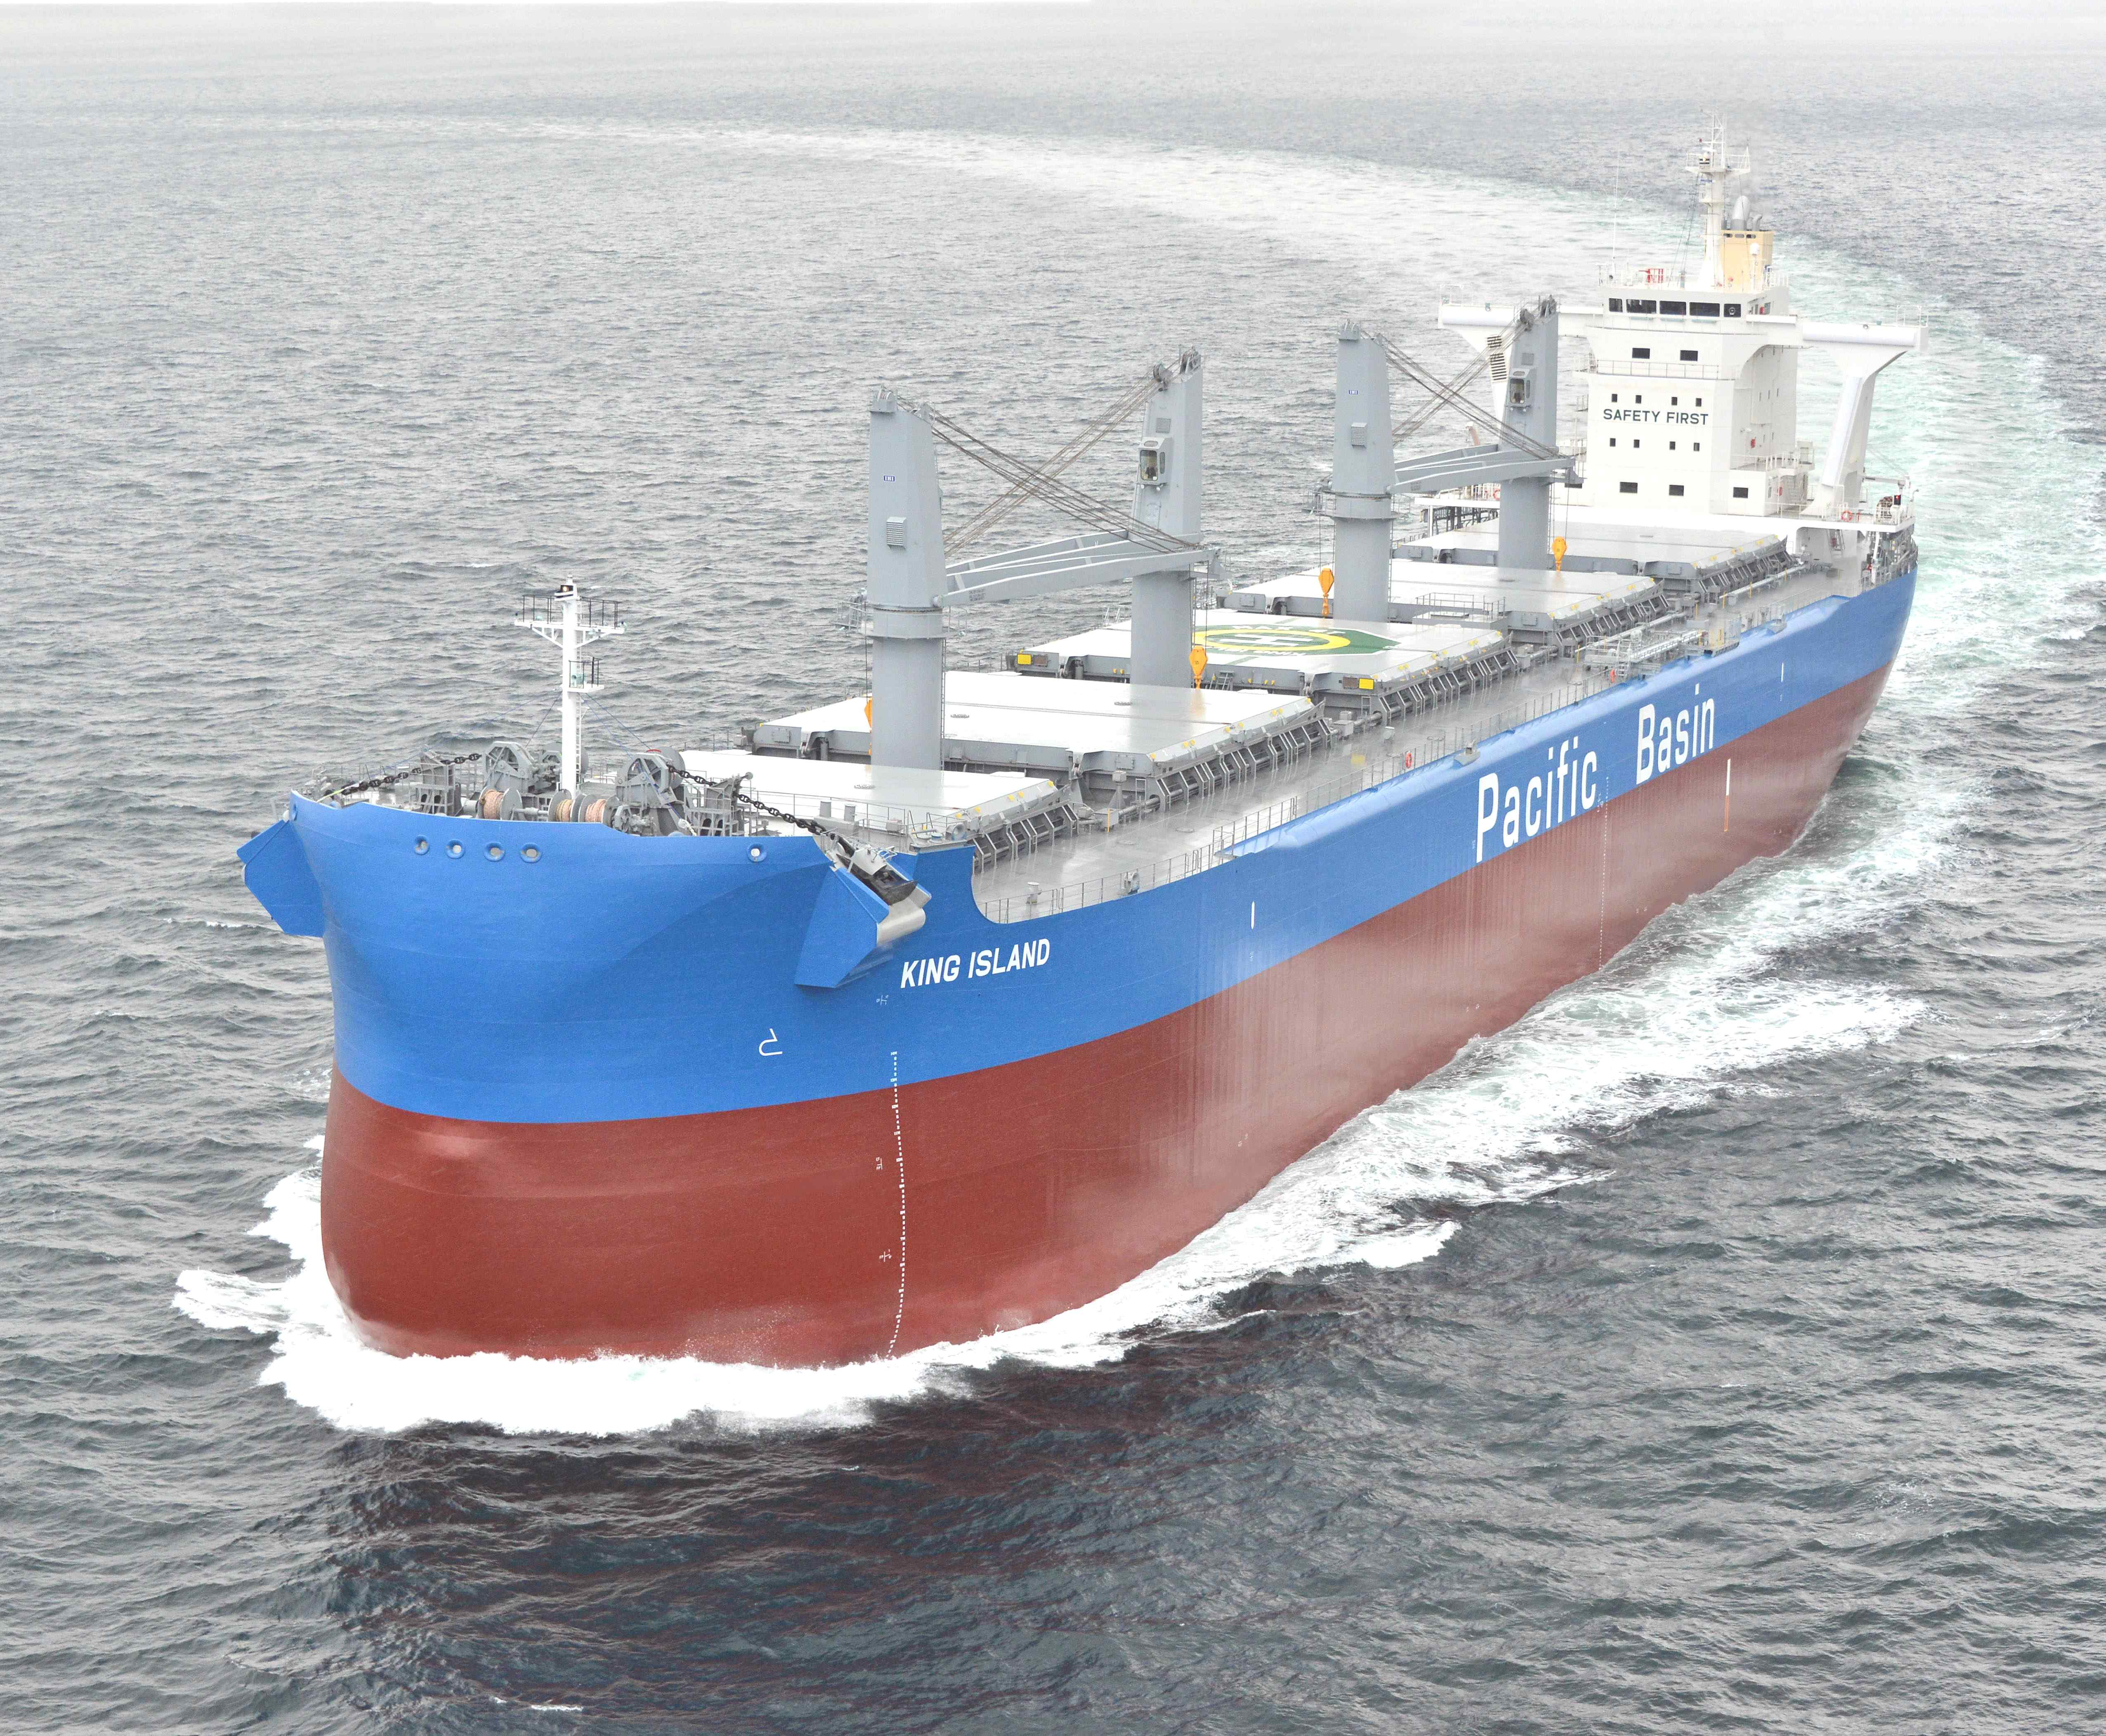 KING ISLAND sea trial